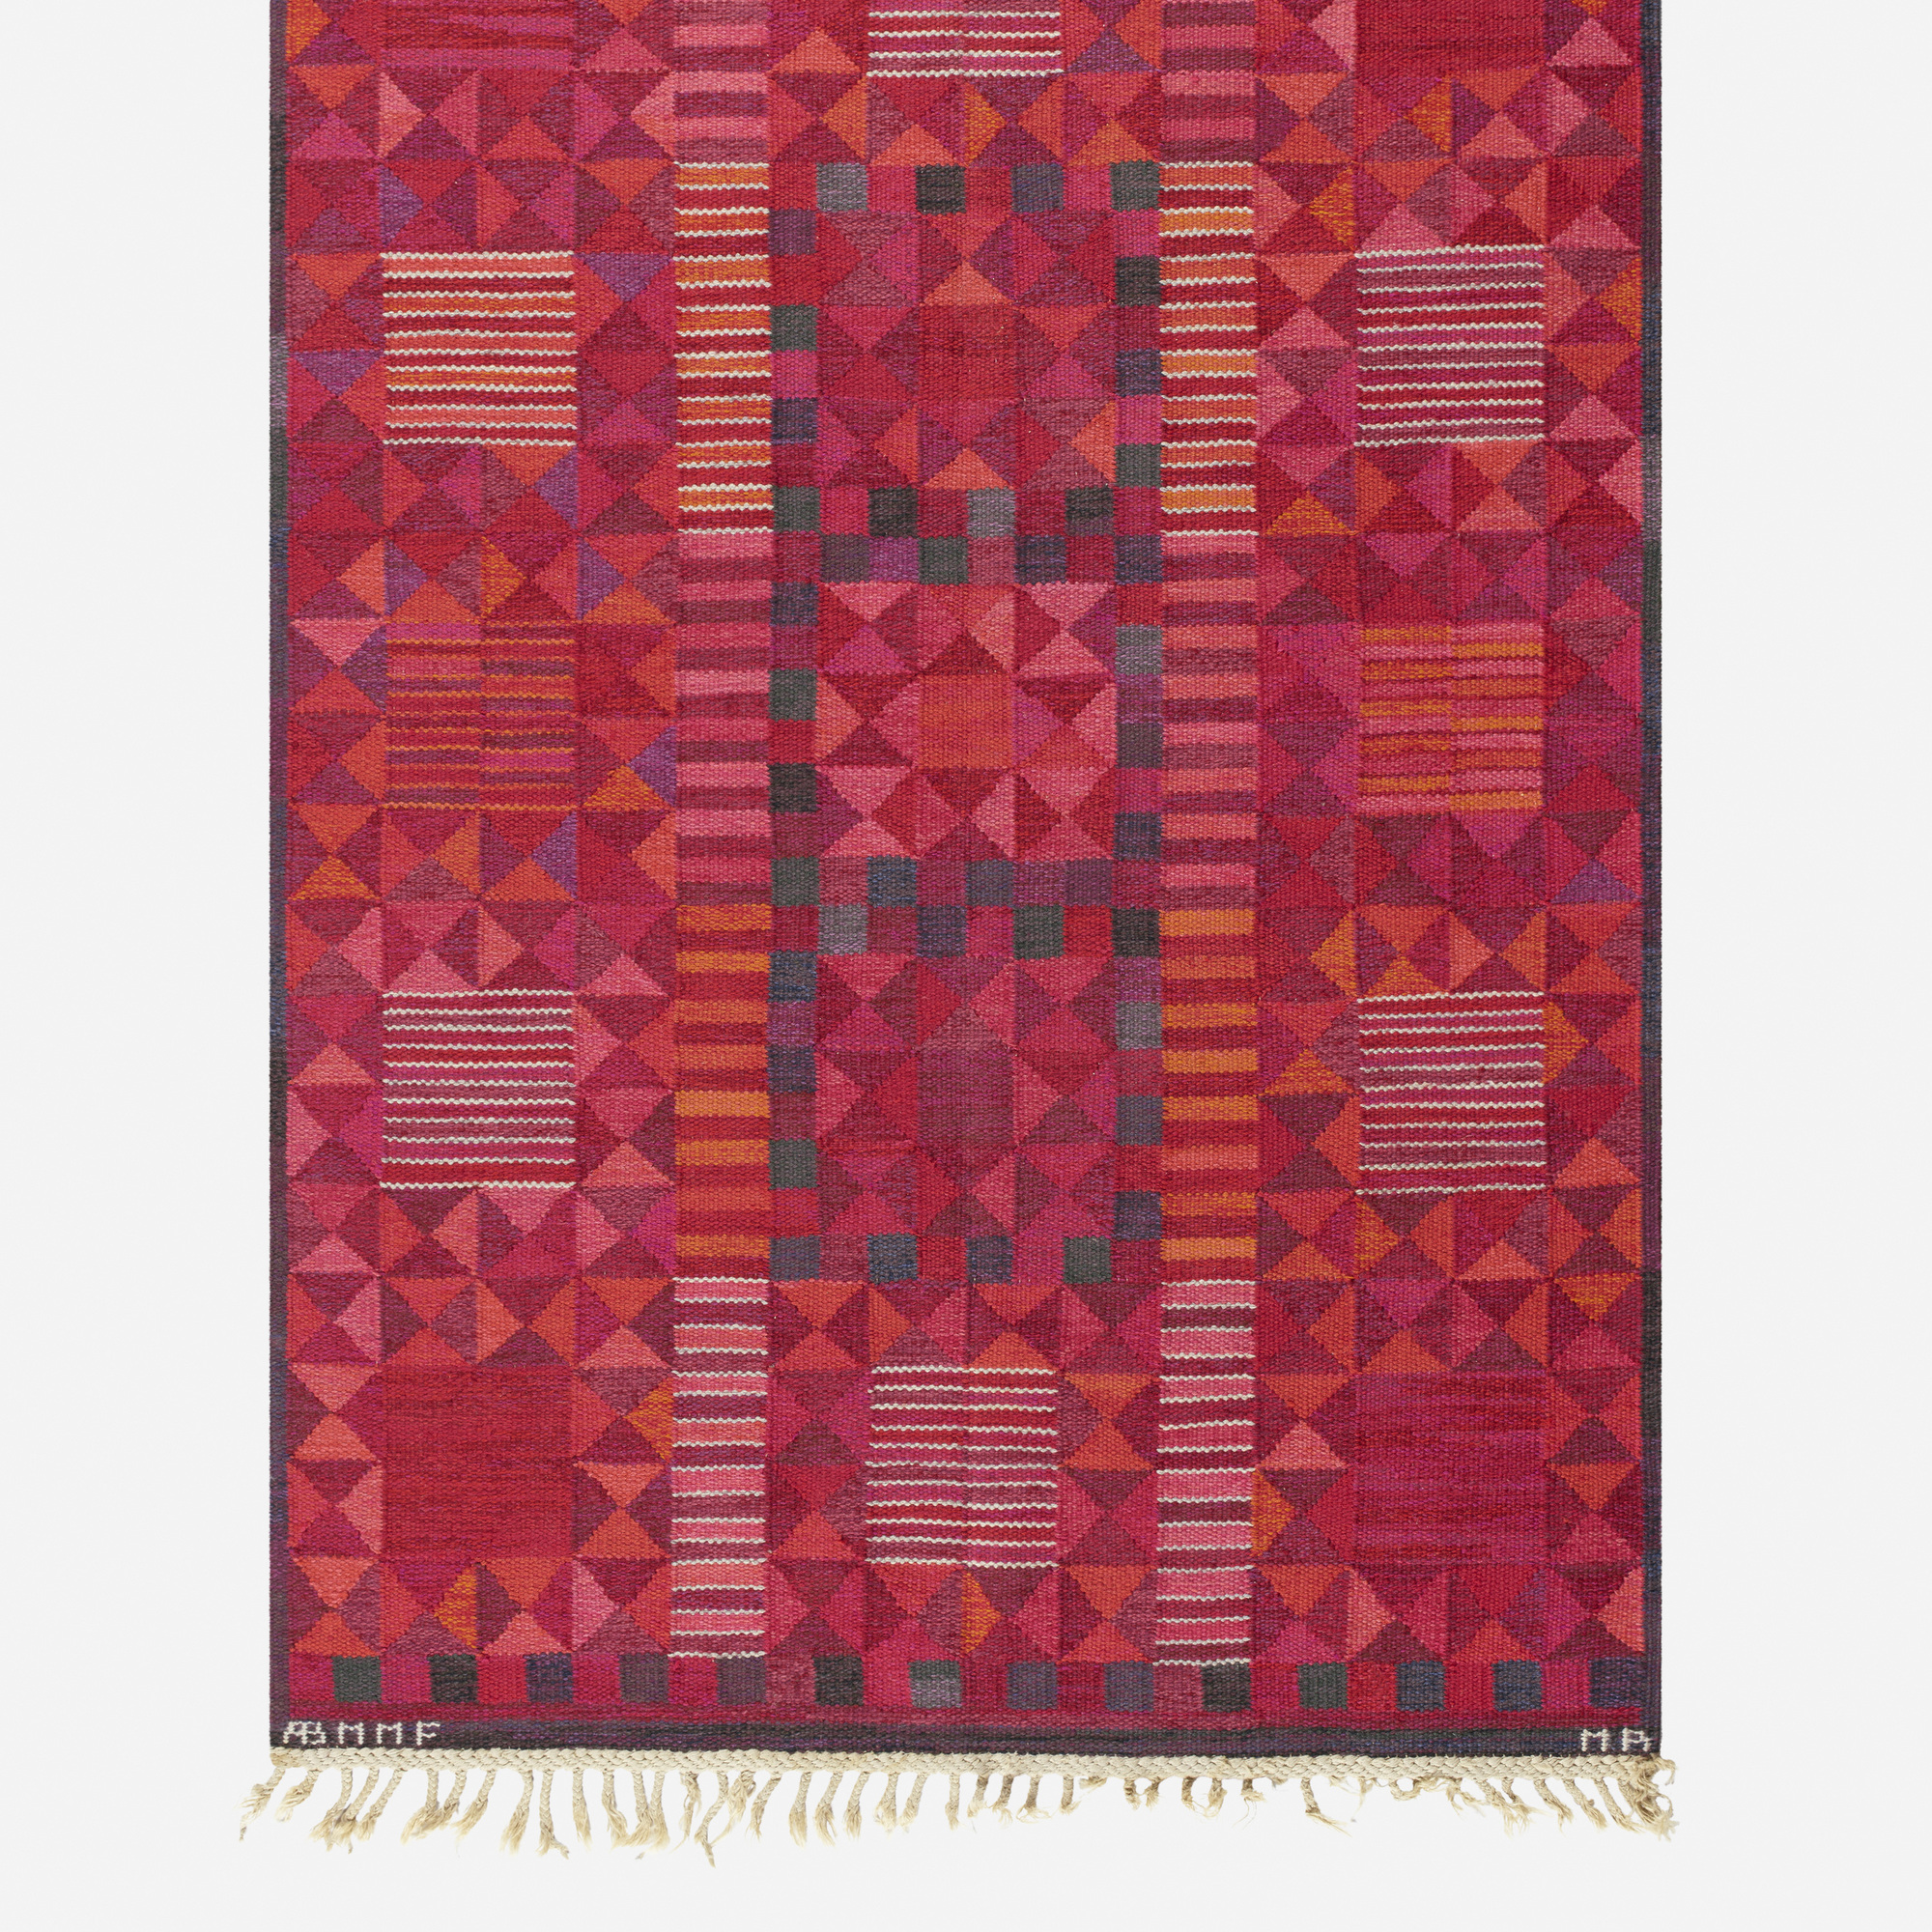 151: Marianne Richter / Rubirosa flatweave carpet (2 of 3)